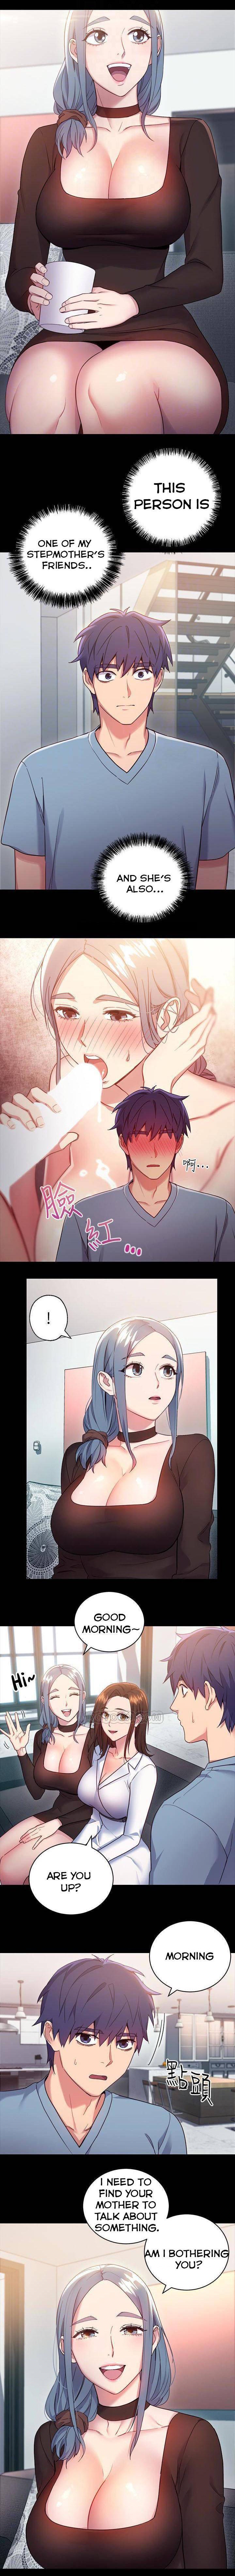 [Neck Pilllow] Stepmother Friends Ch.39/? [English] [Hentai Universe] NEW! 13/10/2020 106